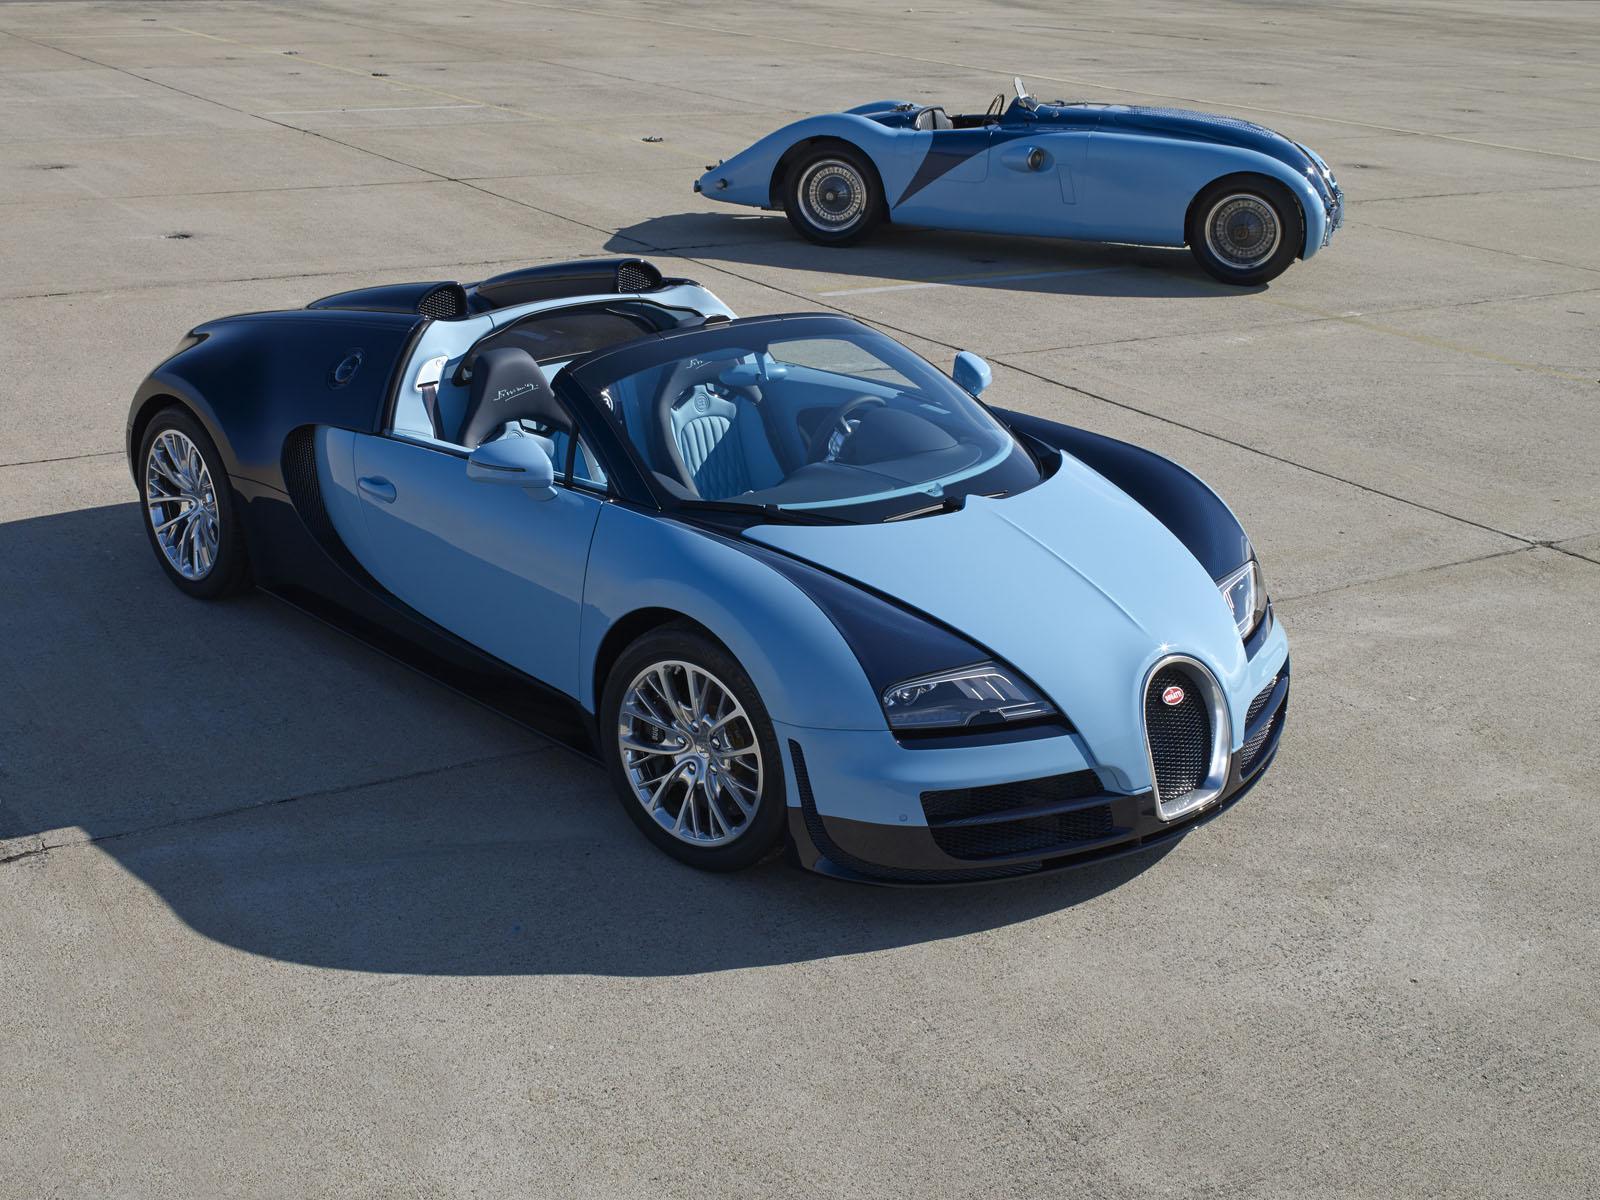 bugatti-legend-jean-pierre-wimille-veyron-grand-sport-vitesse_100437273_h Fascinating Bugatti Veyron Grand Sport Vitesse Convertible Cars Trend